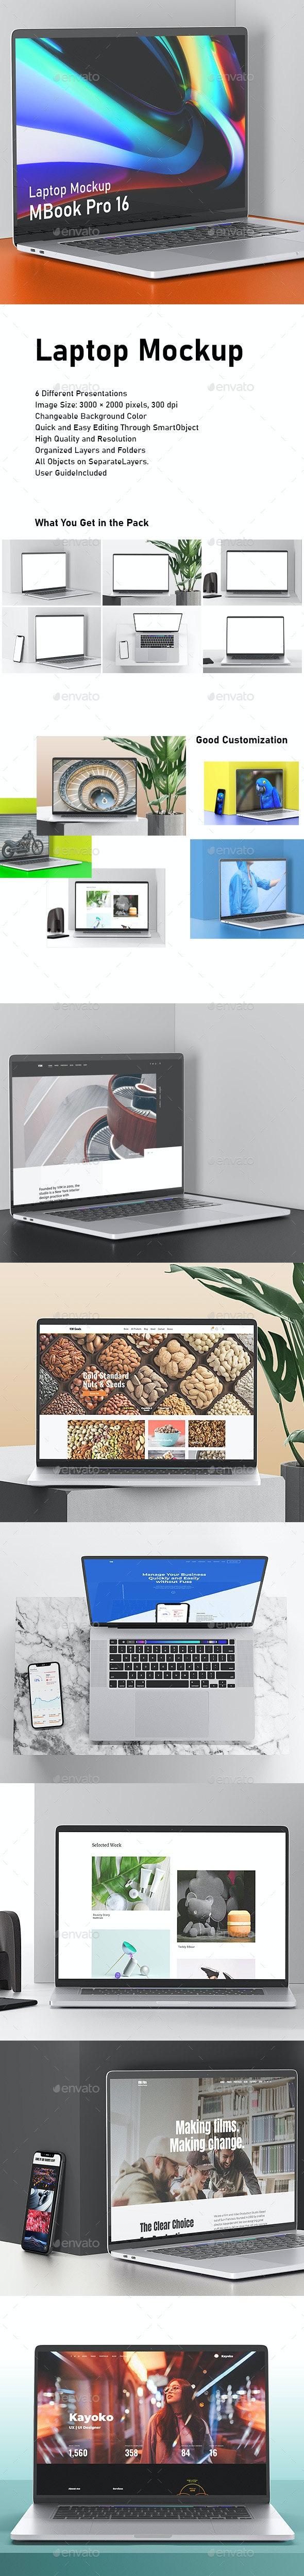 Laptop Mockup - Displays Product Mock-Ups